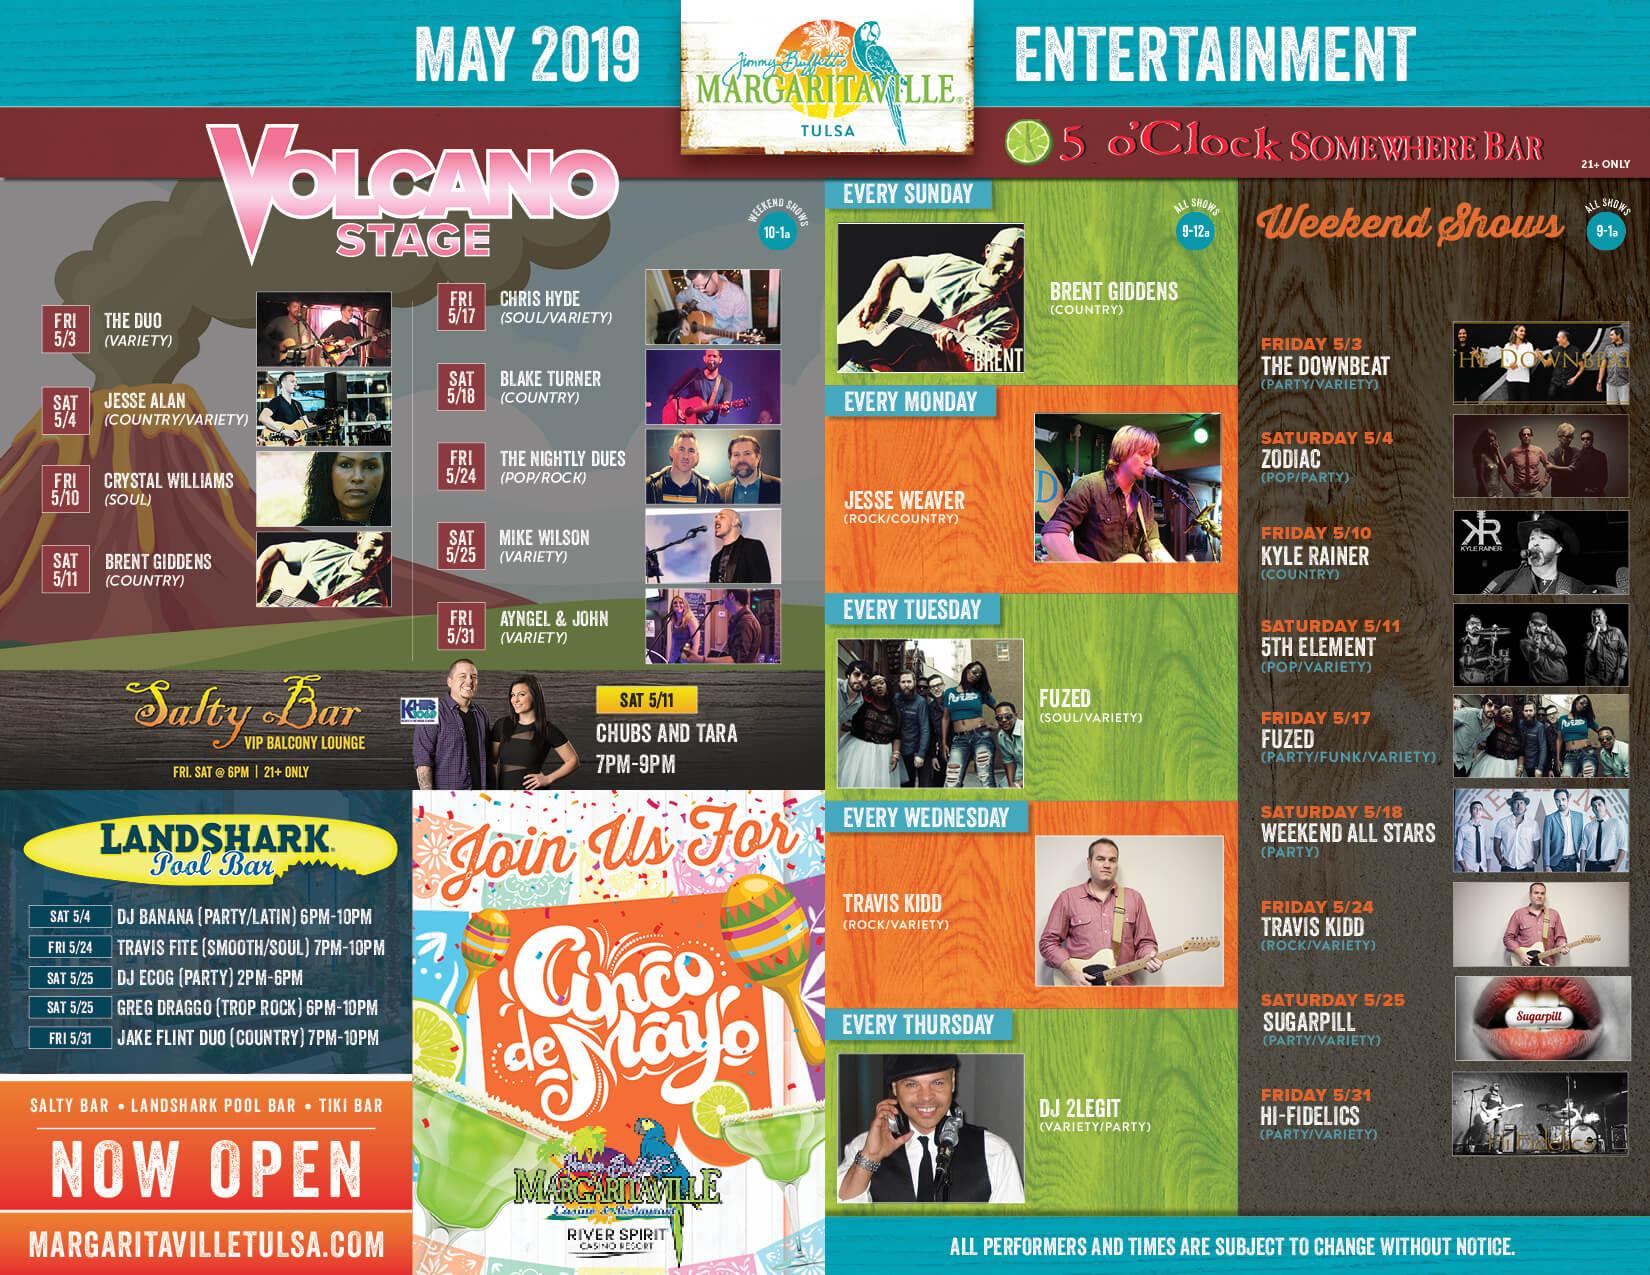 Margaritaville Tulsa May Calendar of Events